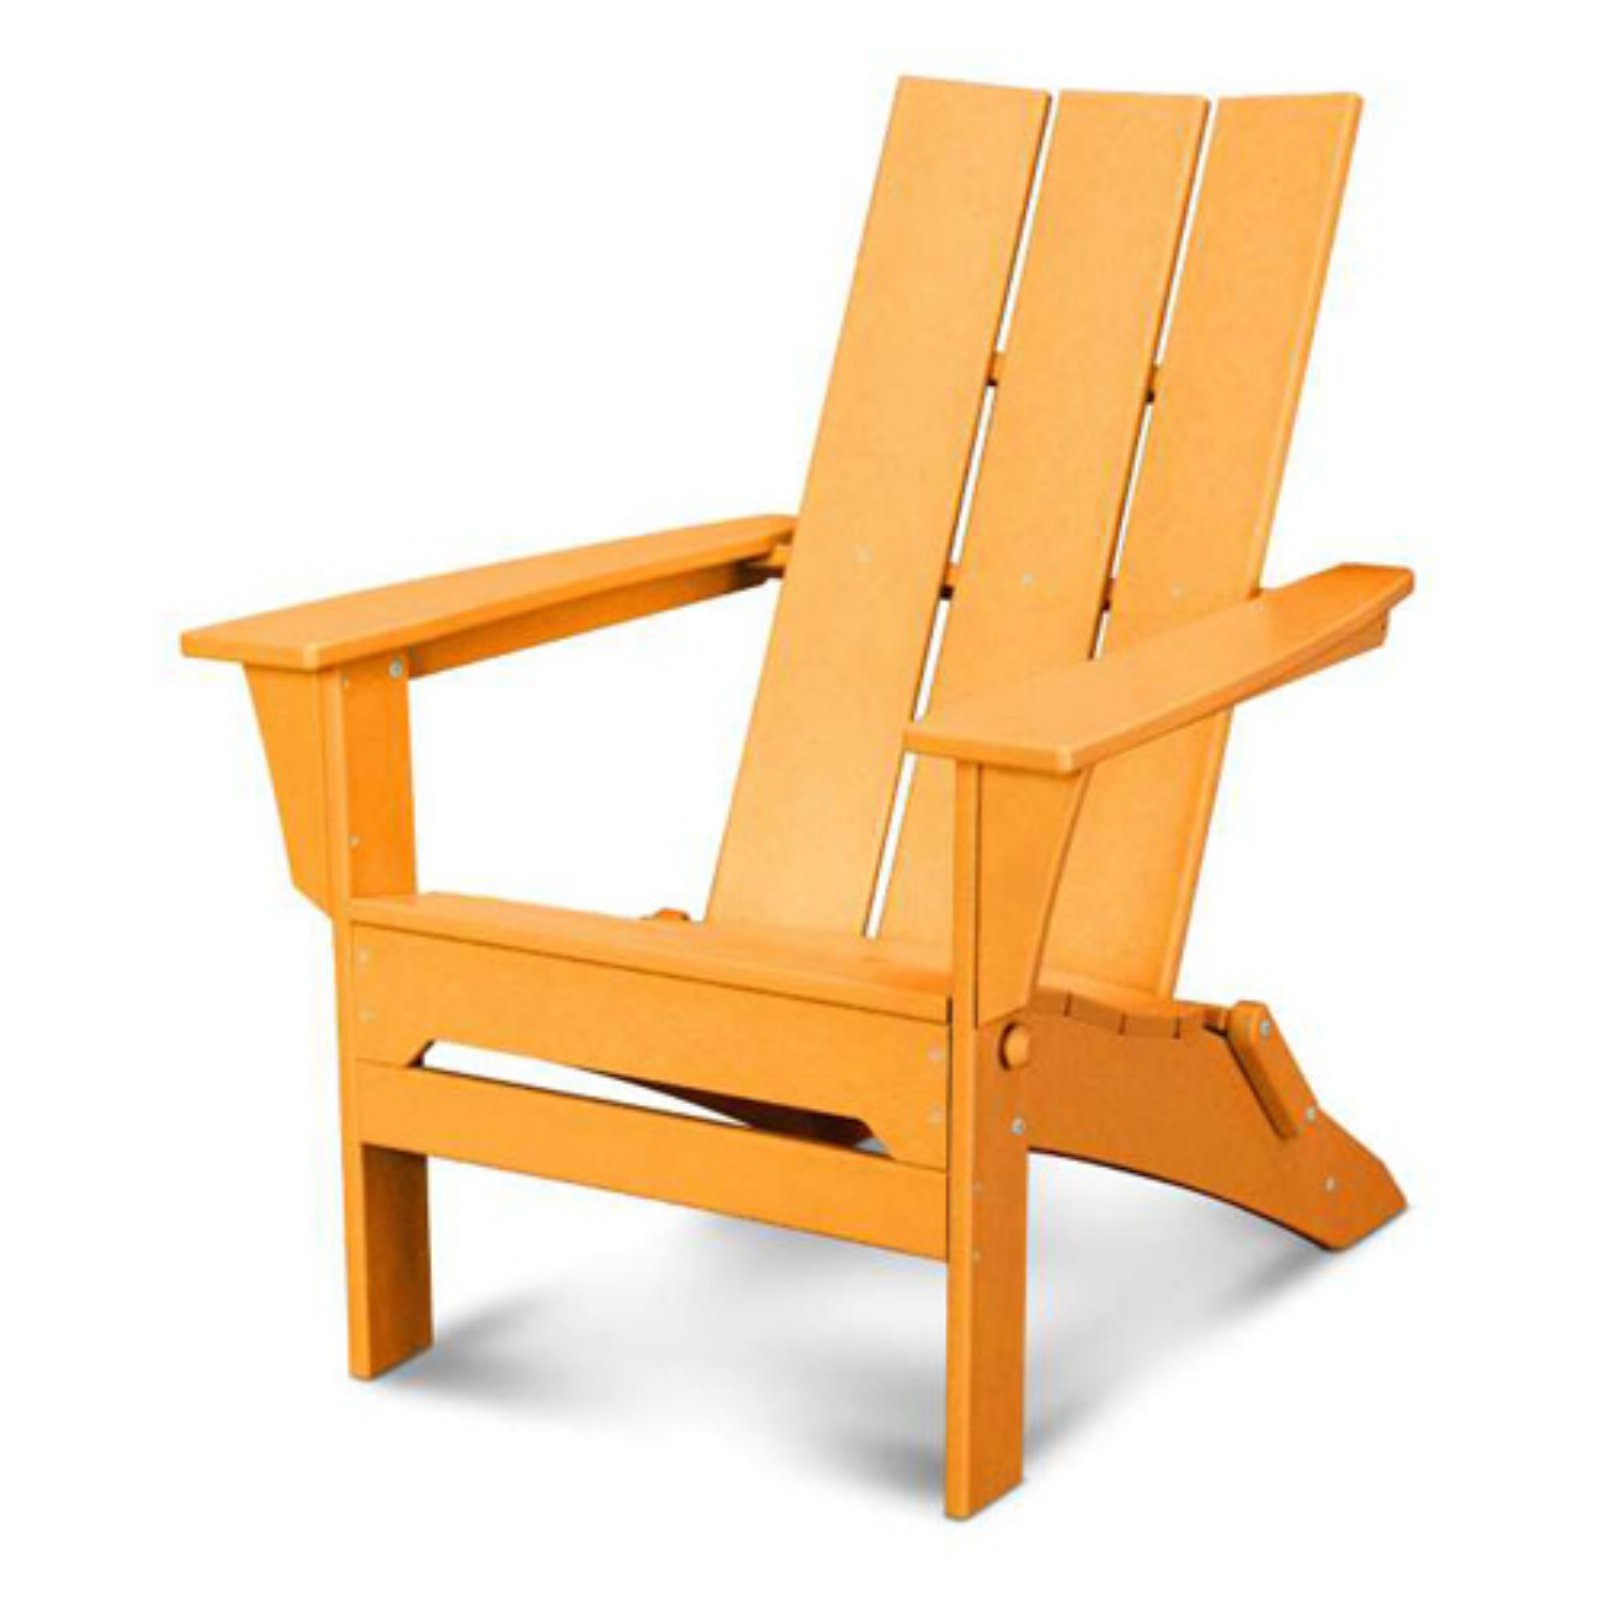 POLYWOOD Modern Folding Adirondack Chair by Poly-Wood